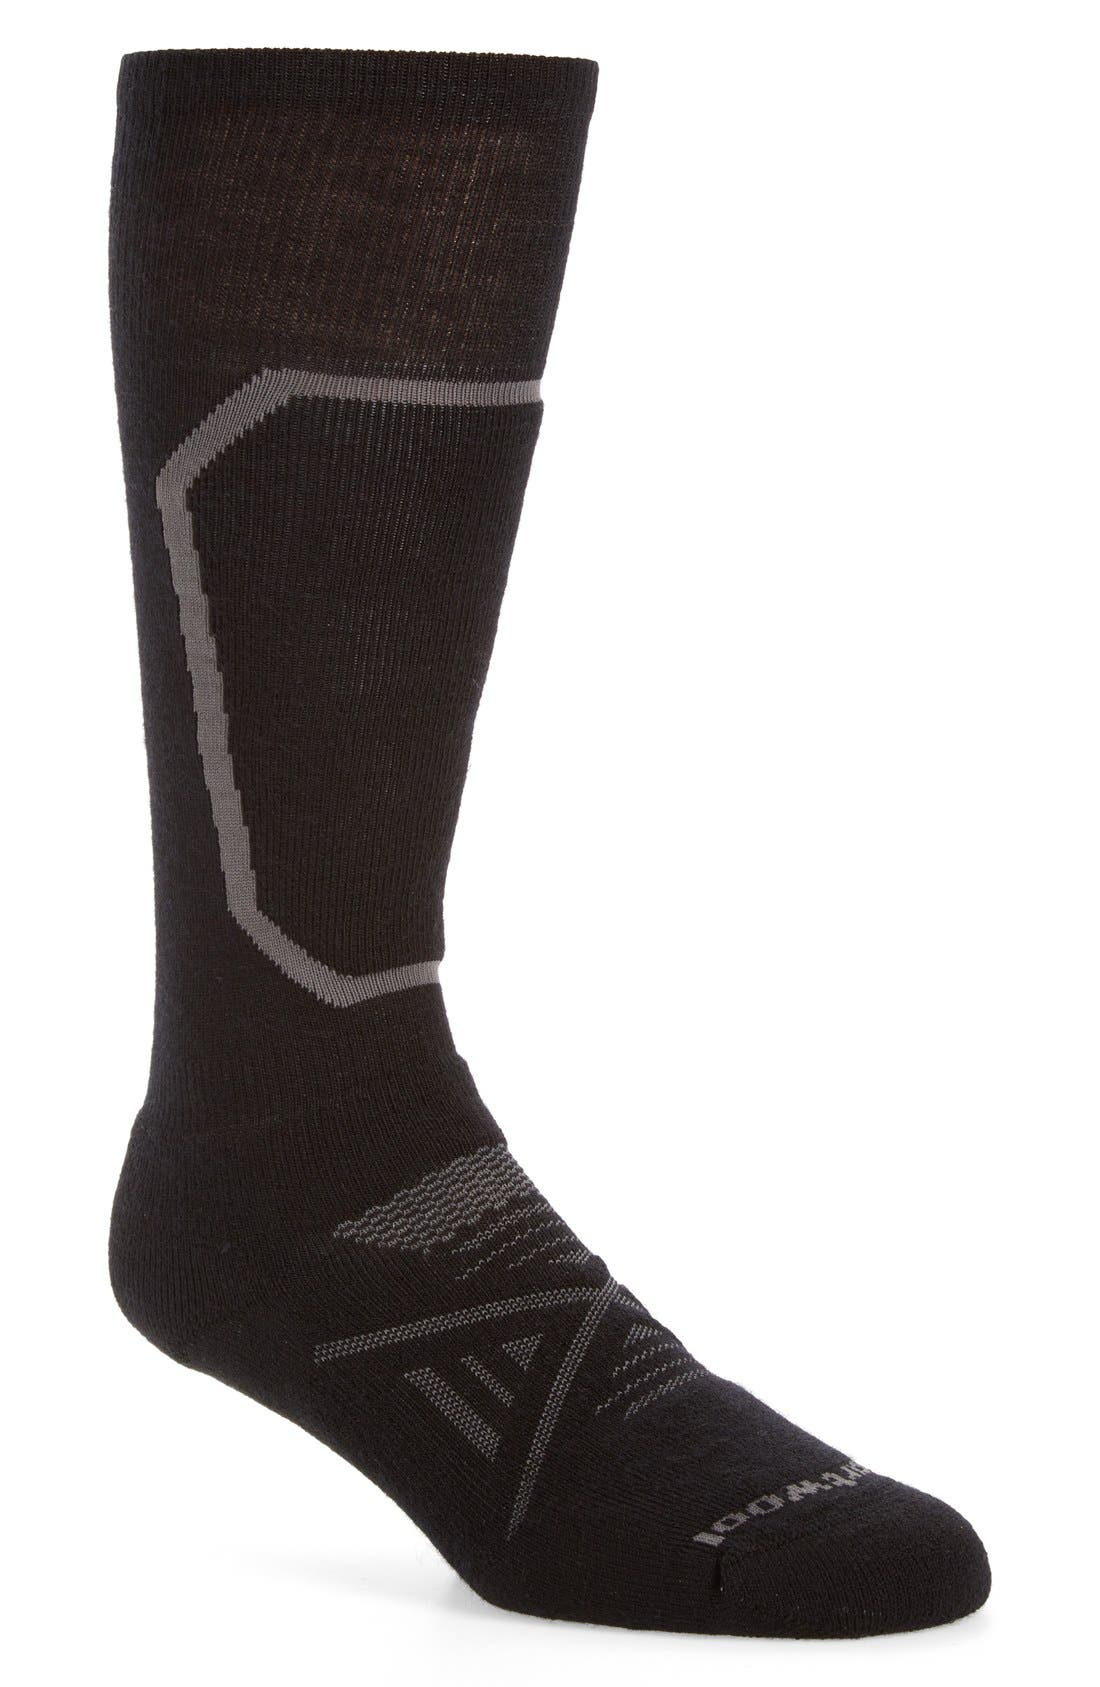 PhD<sup>®</sup> Ski Medium Over the Calf Socks,                         Main,                         color, Black